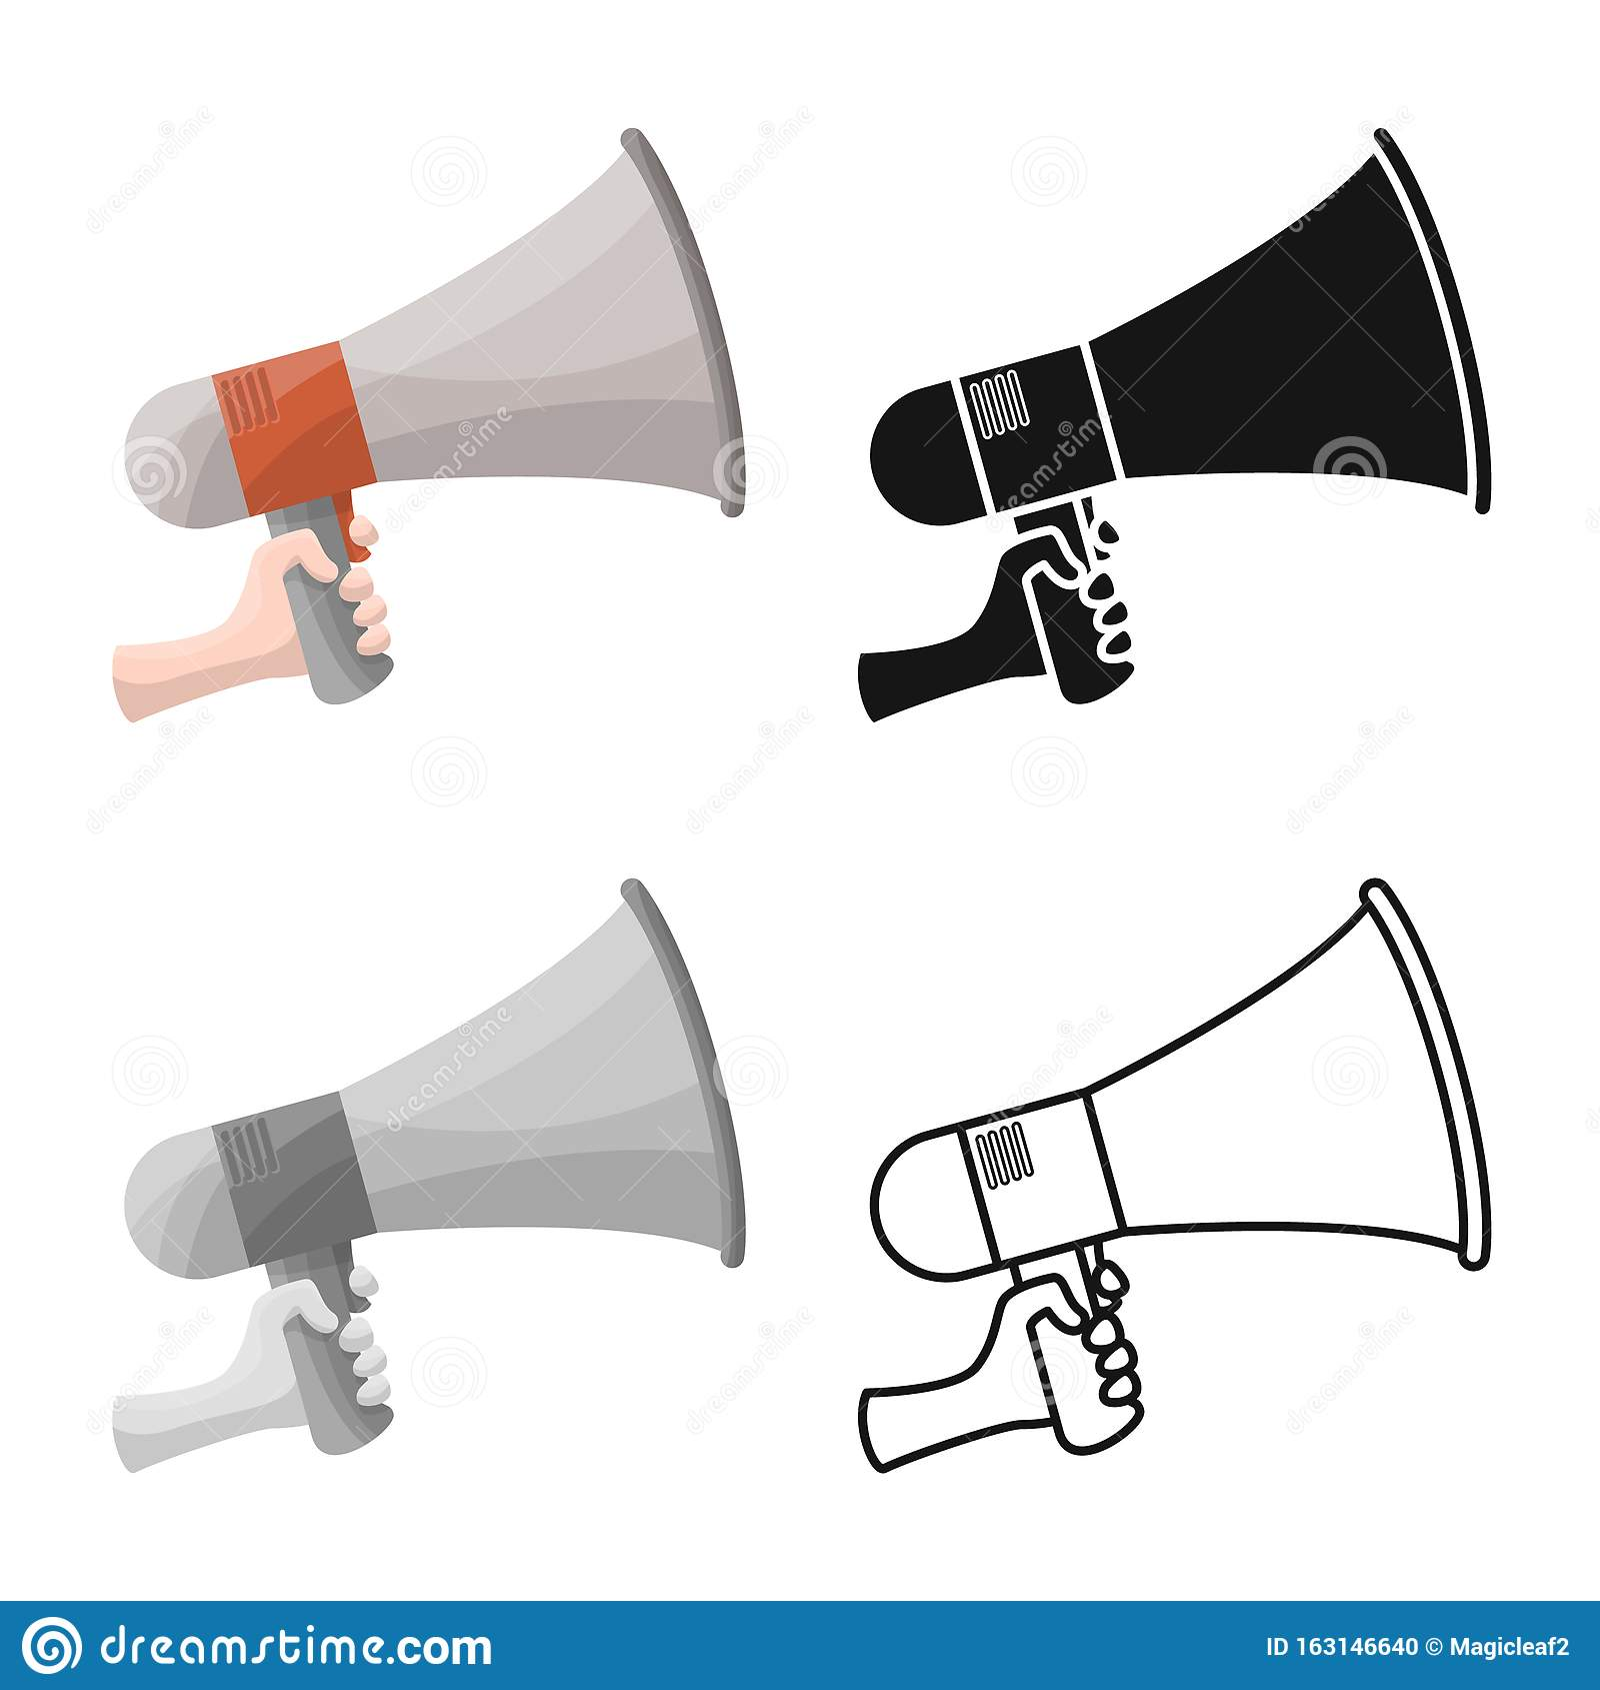 vector design of megaphone and speaker icon graphic of megaphone and loudspeaker stock symbol for web stock vector illustration of sound alert 163146640 dreamstime com